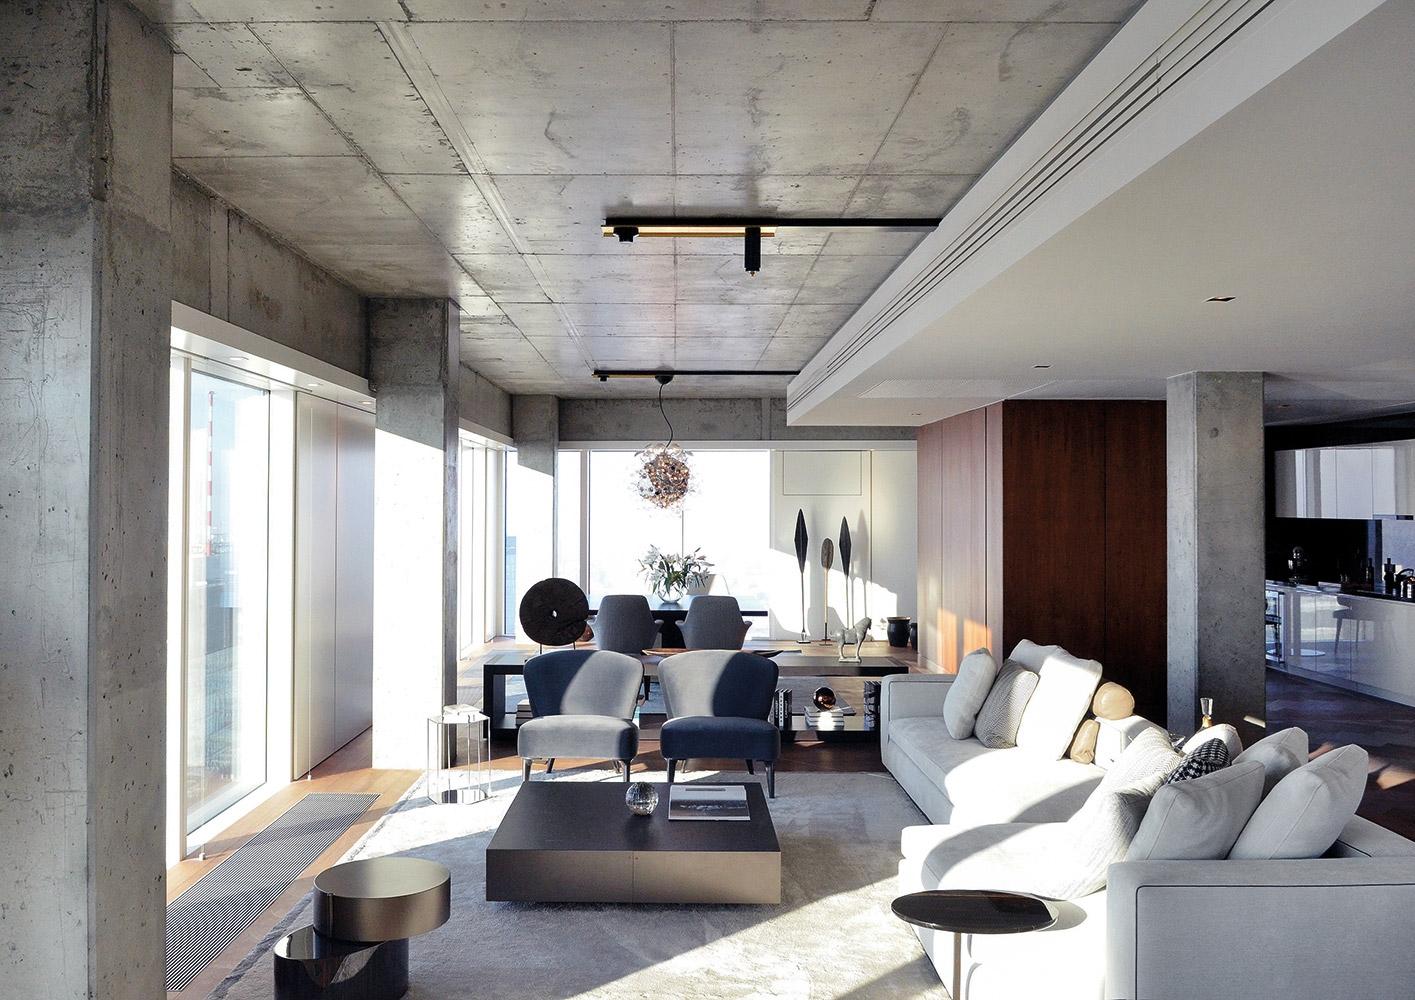 Warsaw zlota 44 apartment complex